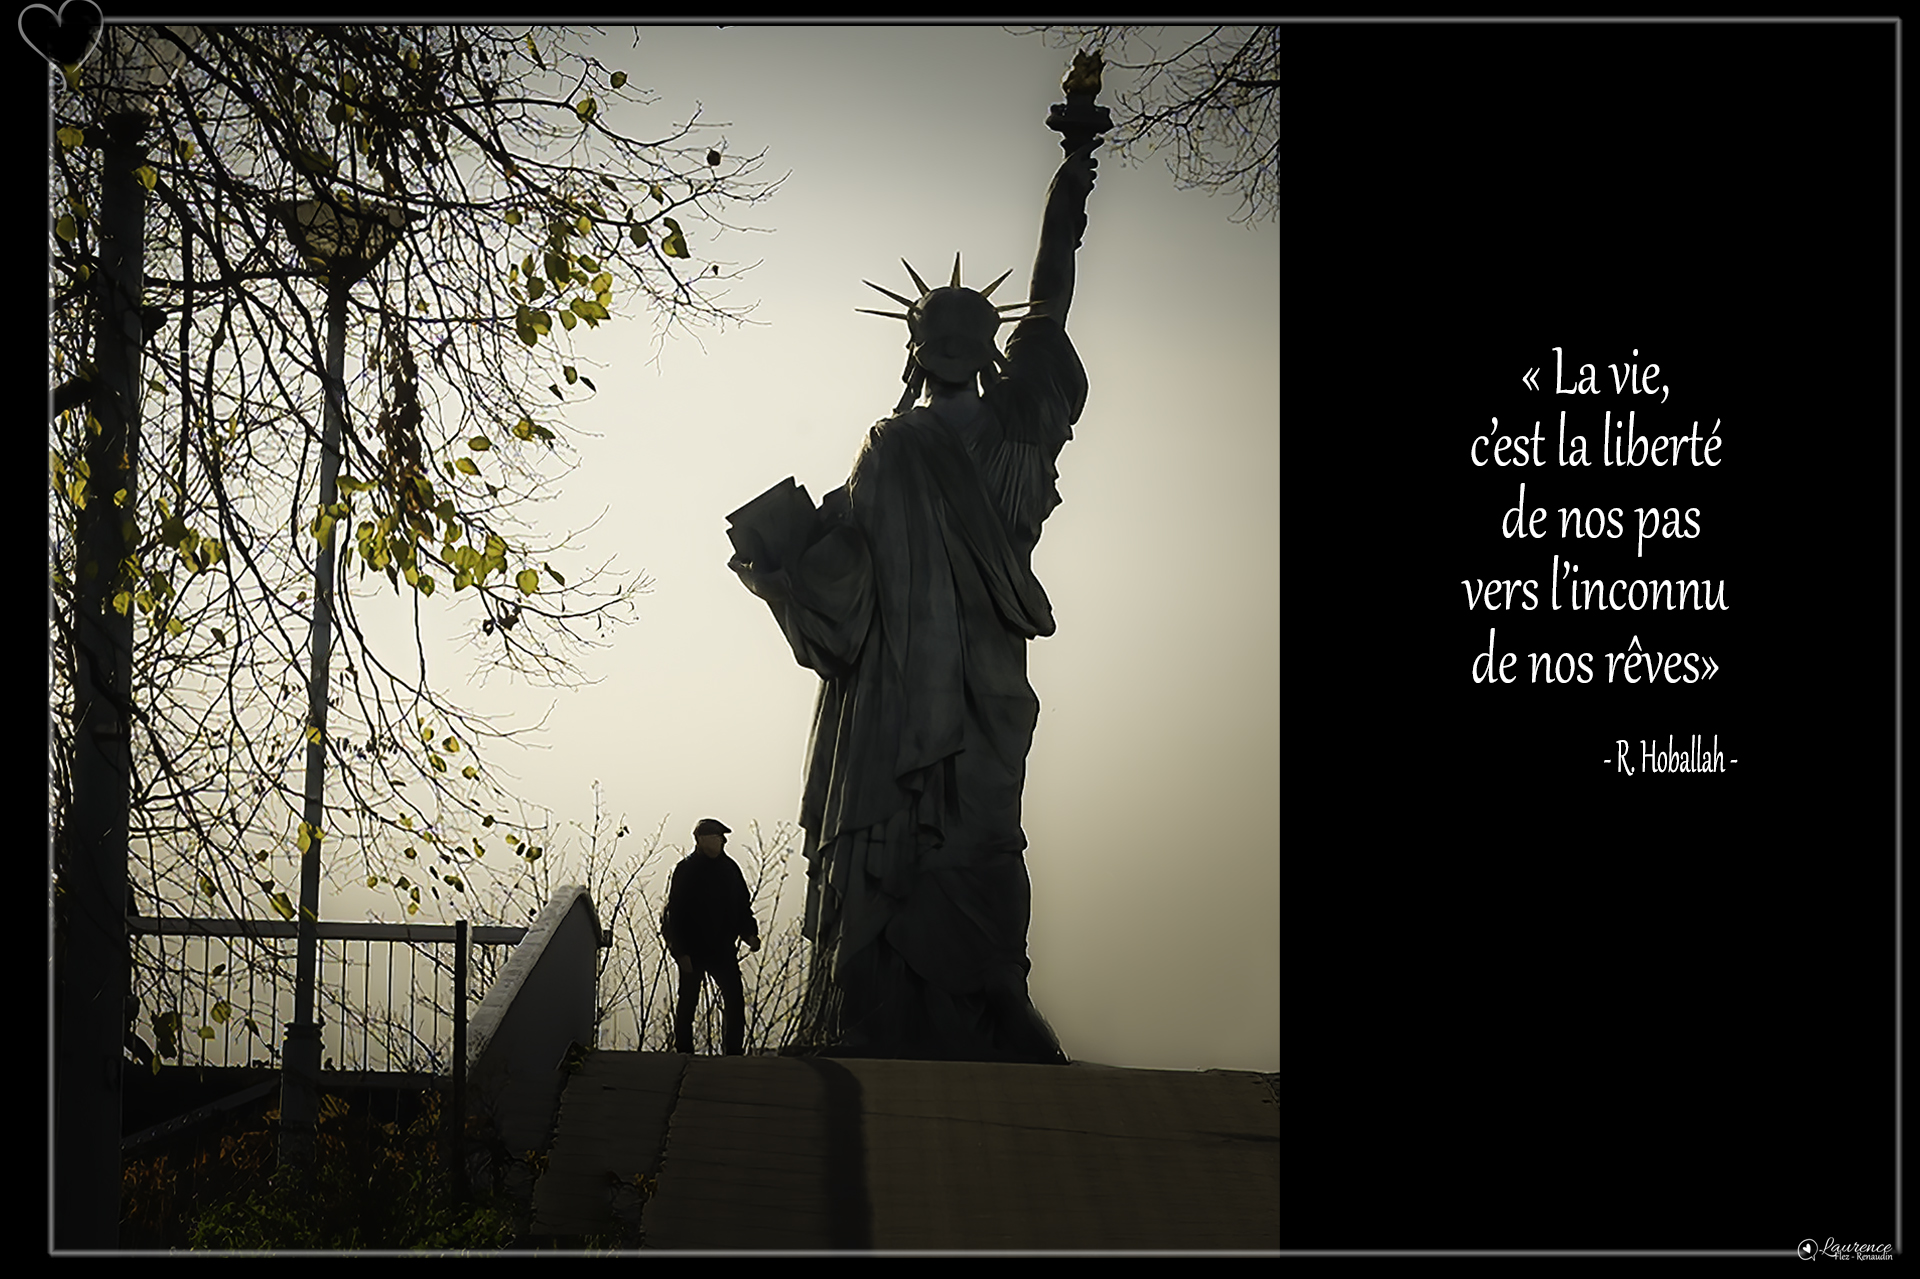 Notre liberté de rêver